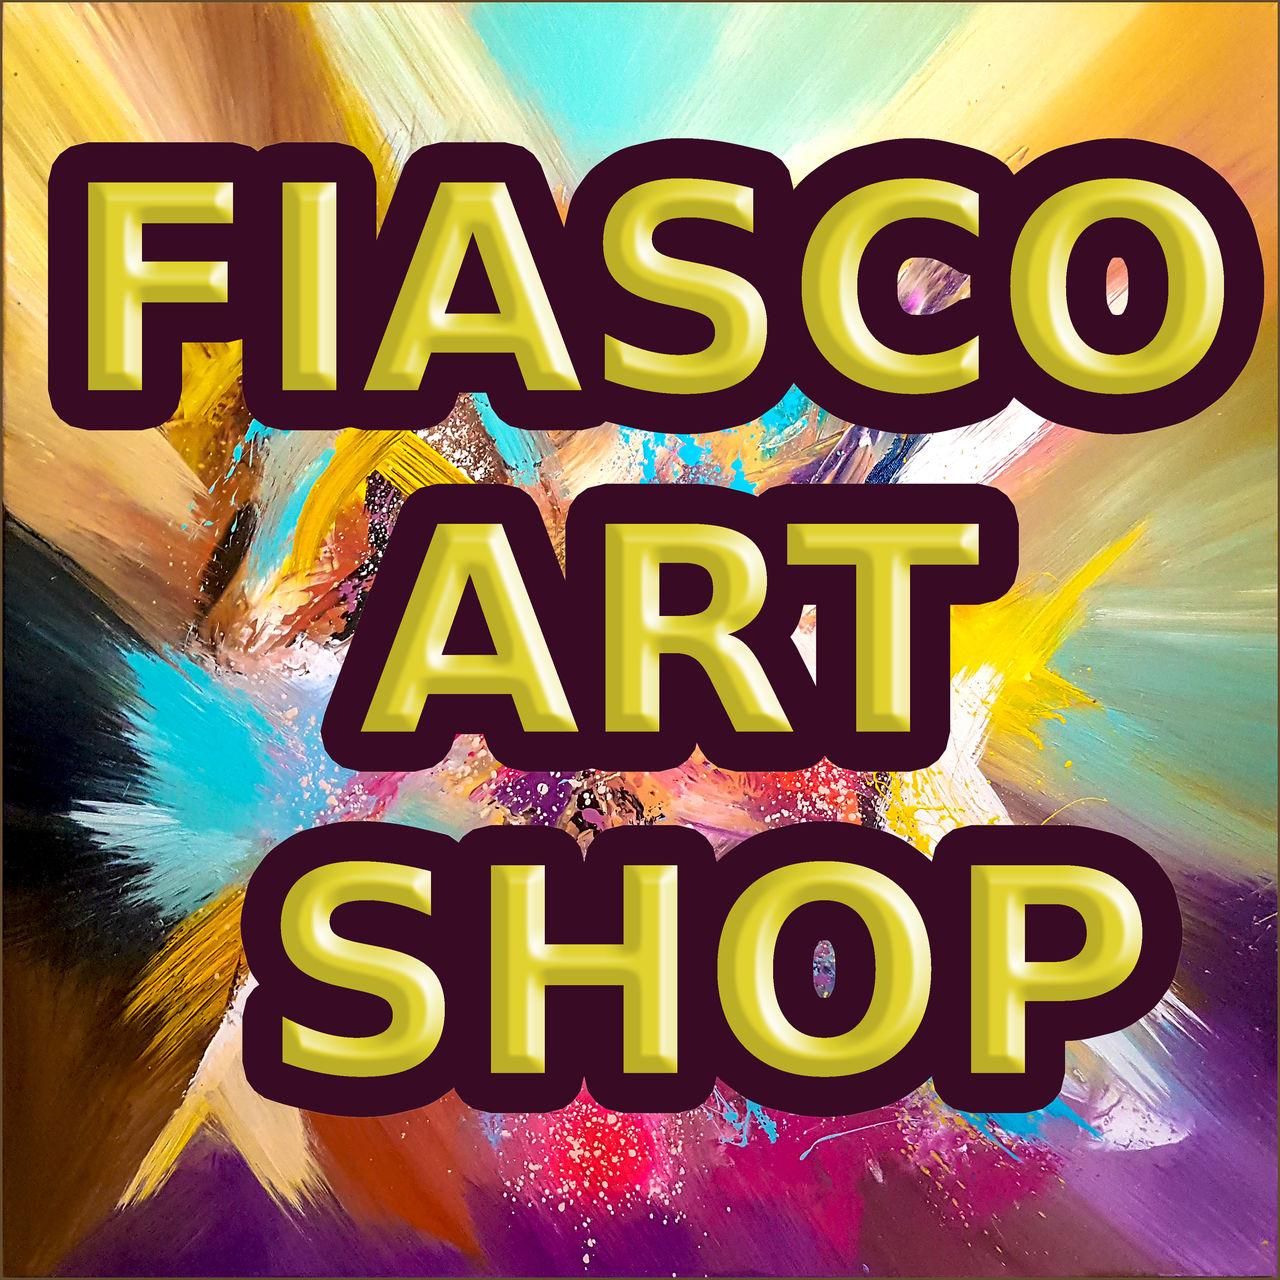 FIASCO Flashlights ARTSHOP4